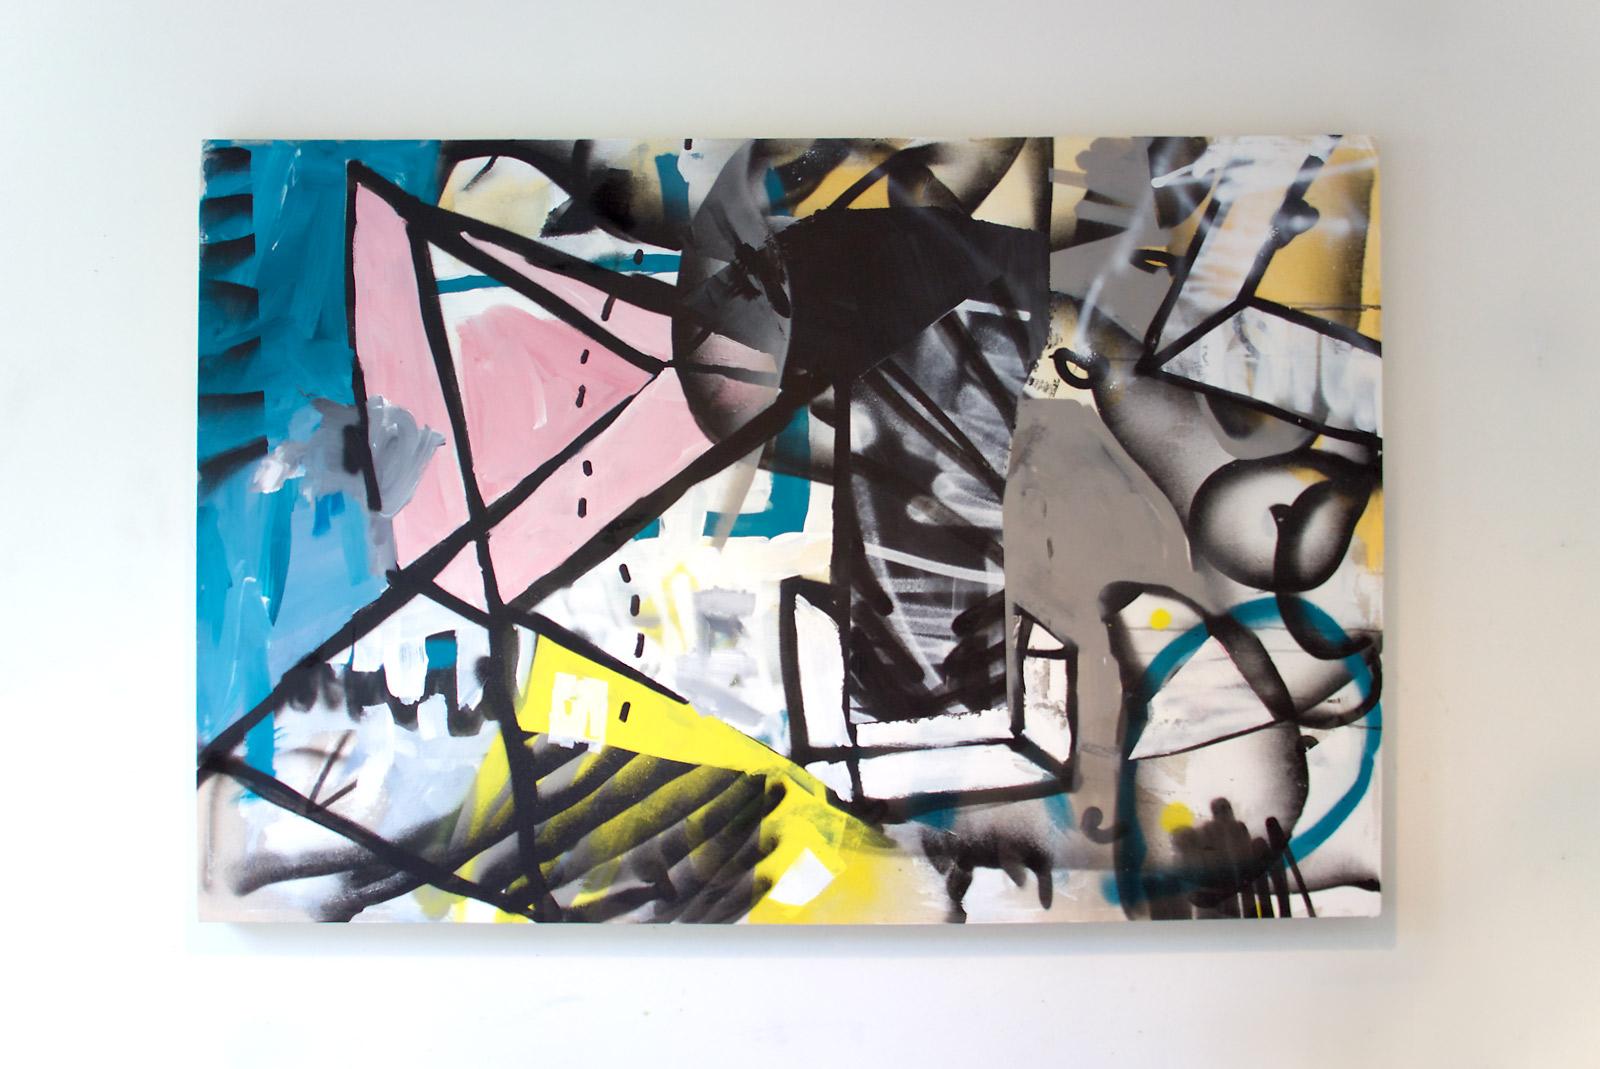 abstract-geometric-street-art-painting